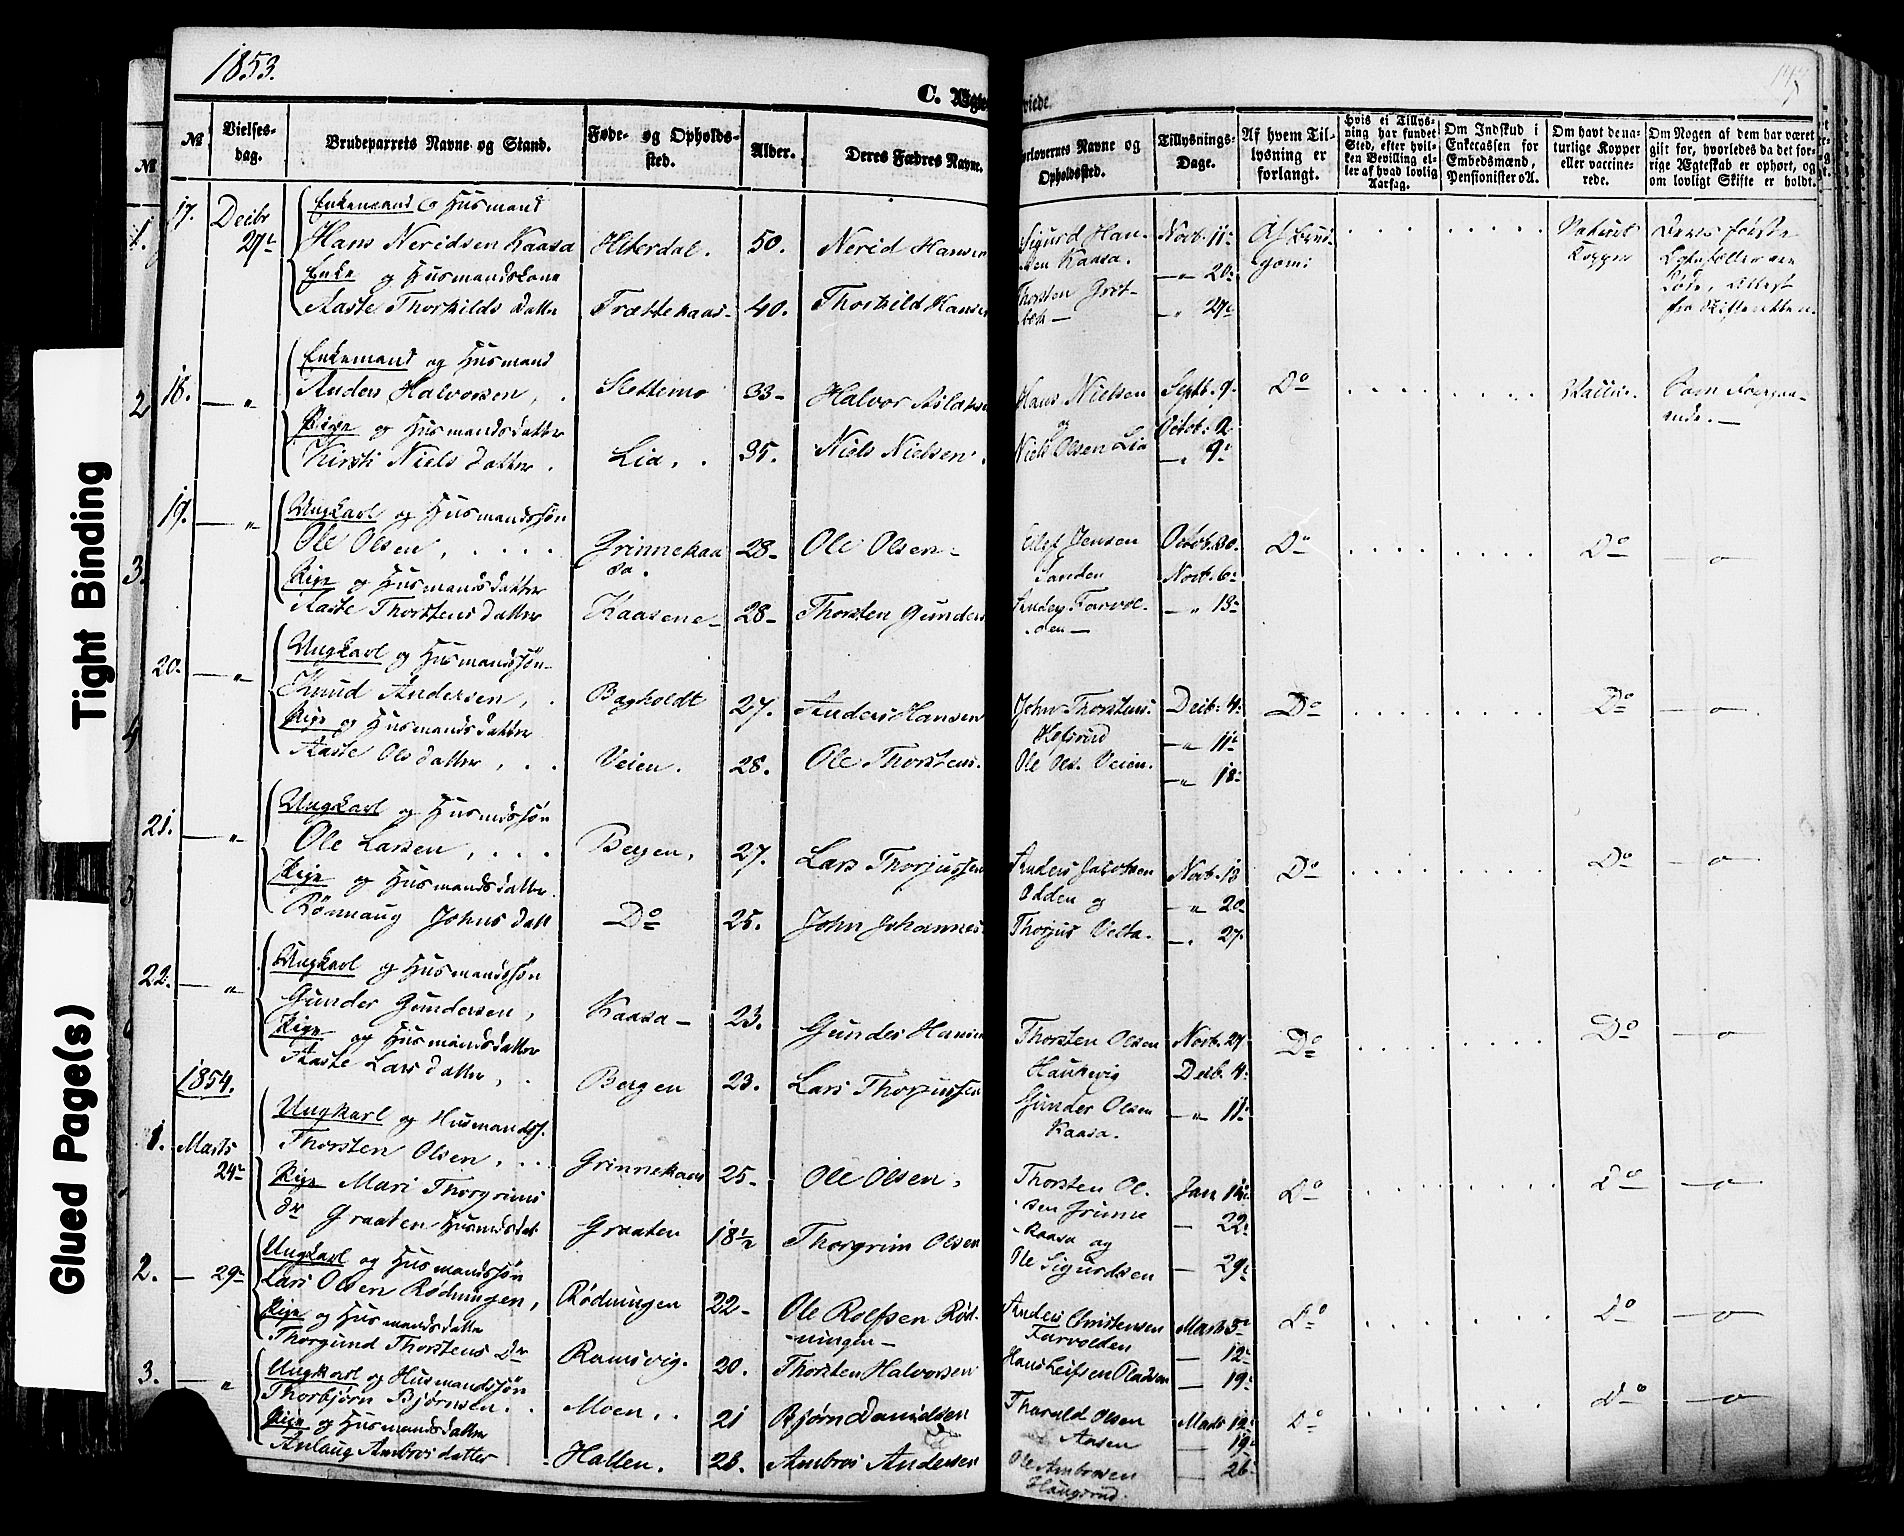 SAKO, Sauherad kirkebøker, F/Fa/L0007: Ministerialbok nr. I 7, 1851-1873, s. 147